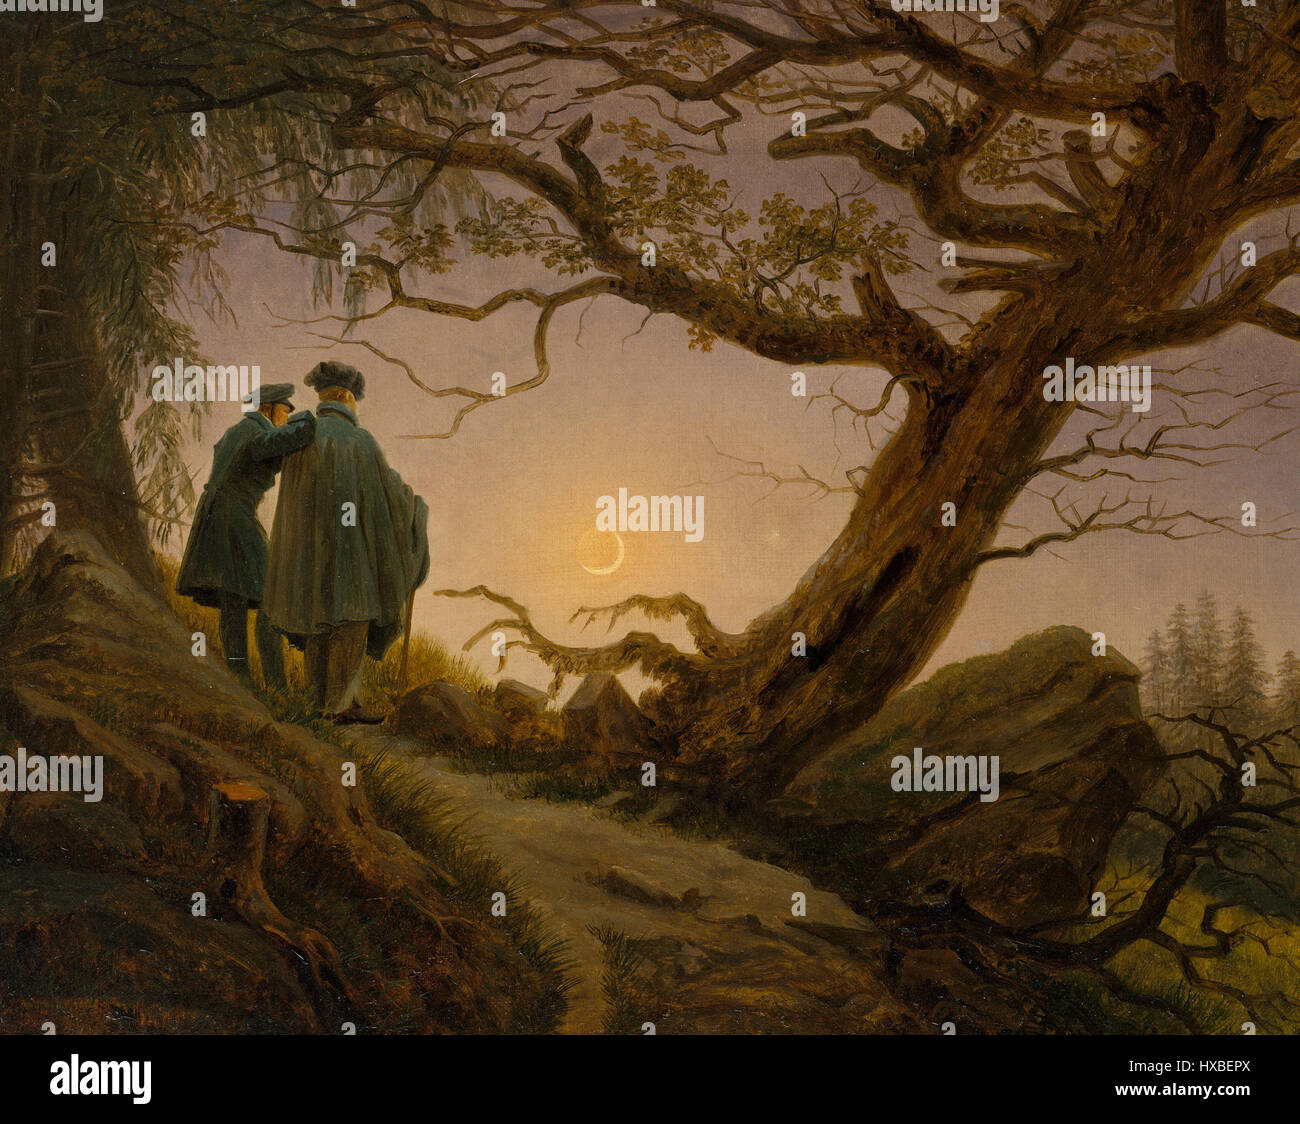 Two Men Contemplating the Moon by Caspar David Friedrich - Stock Image